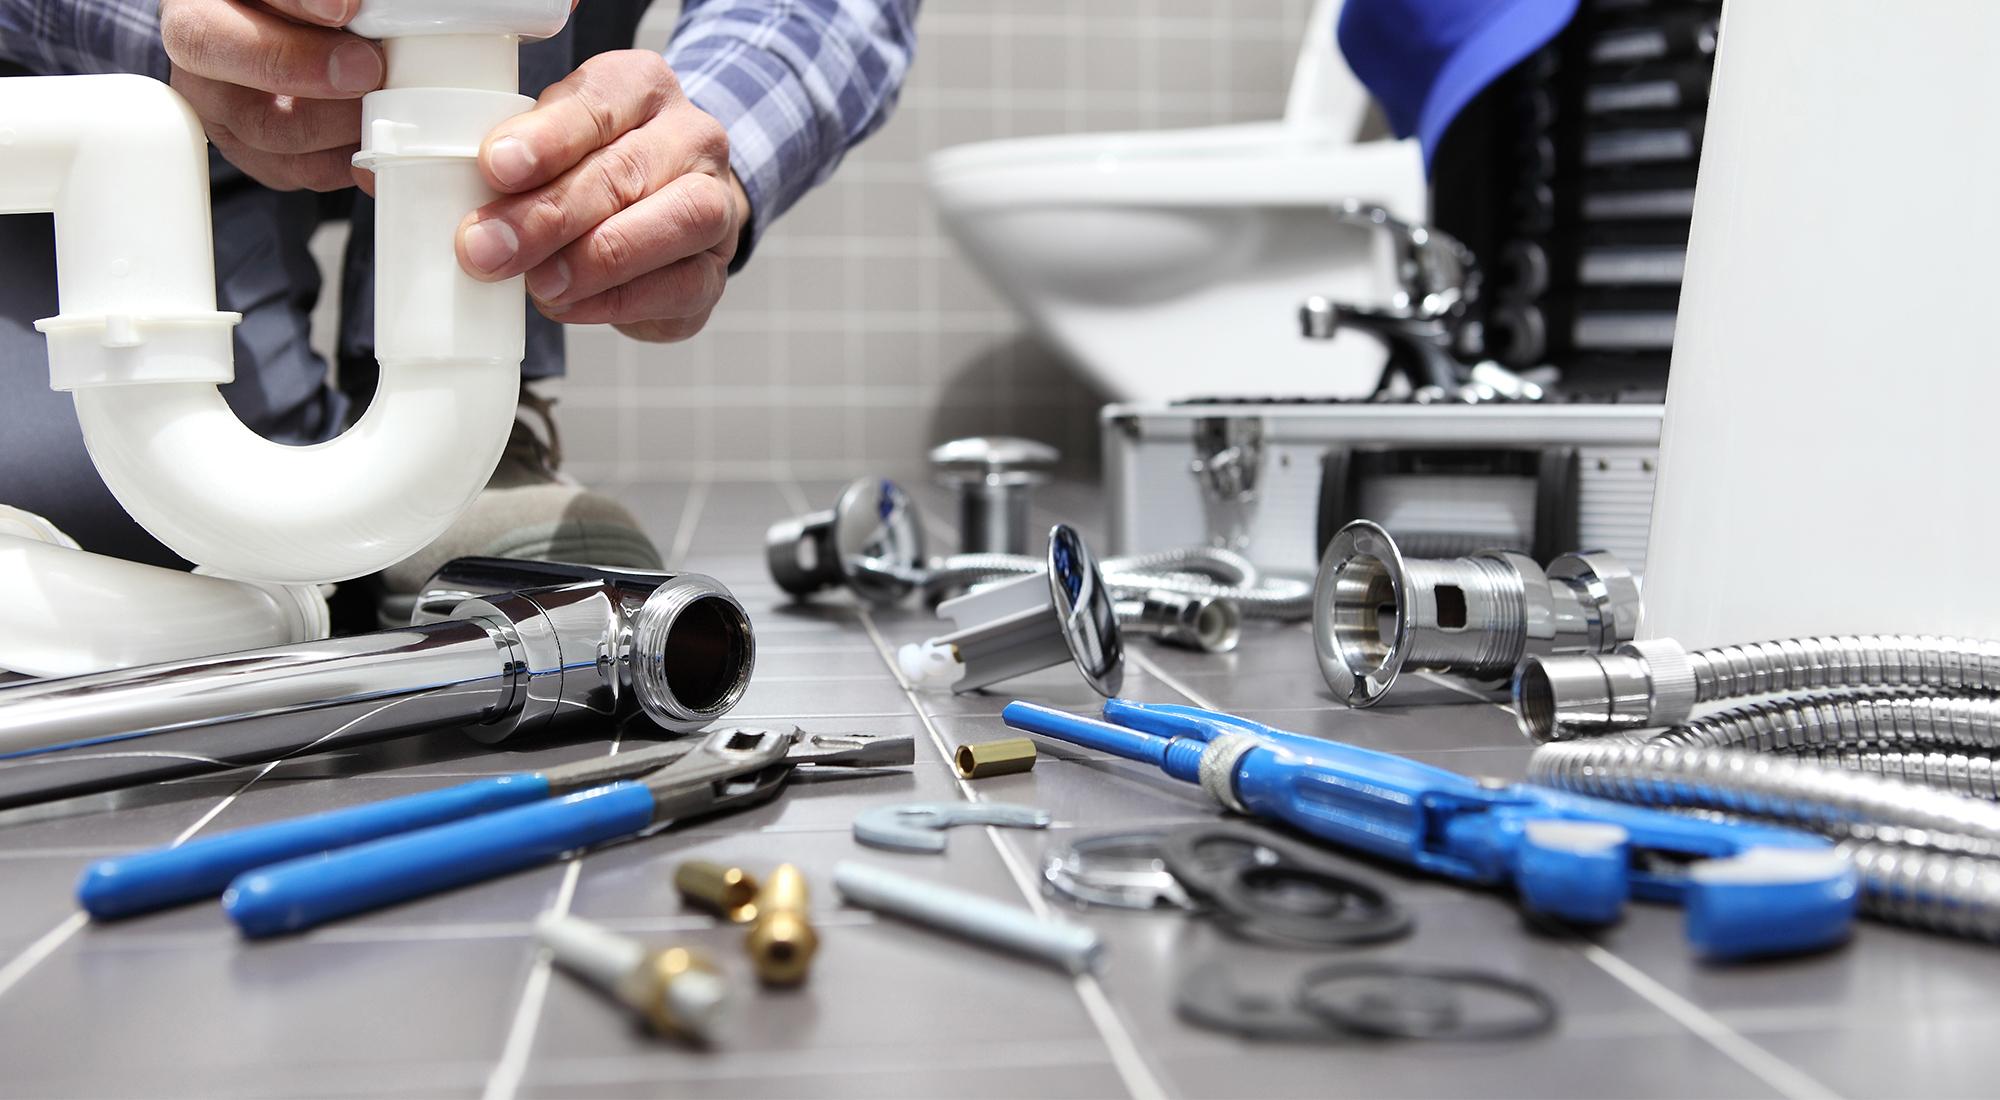 Accounting for Plumbing Companies